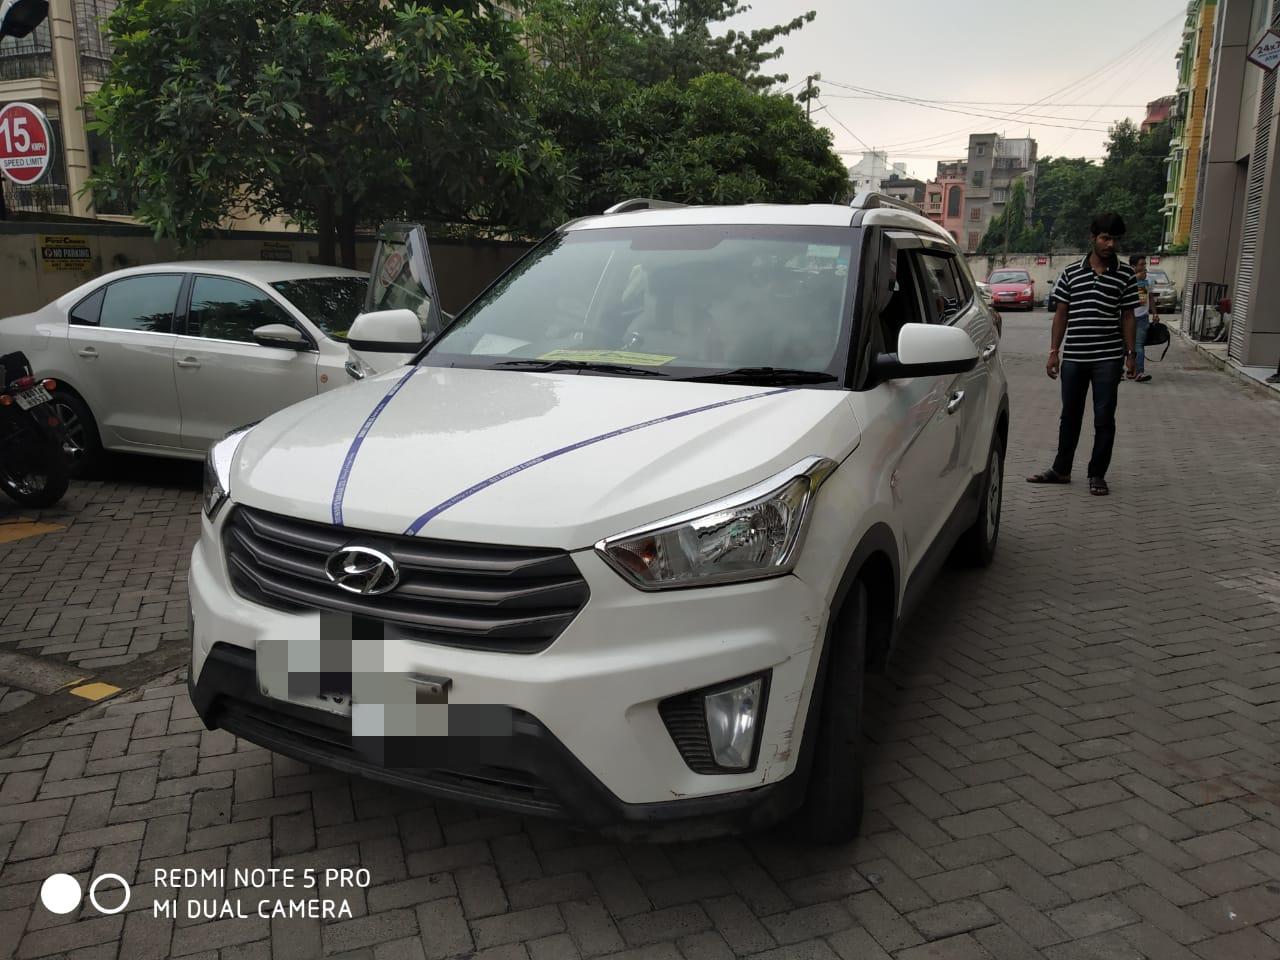 2016 Used Hyundai Creta 1.4 CRDI S